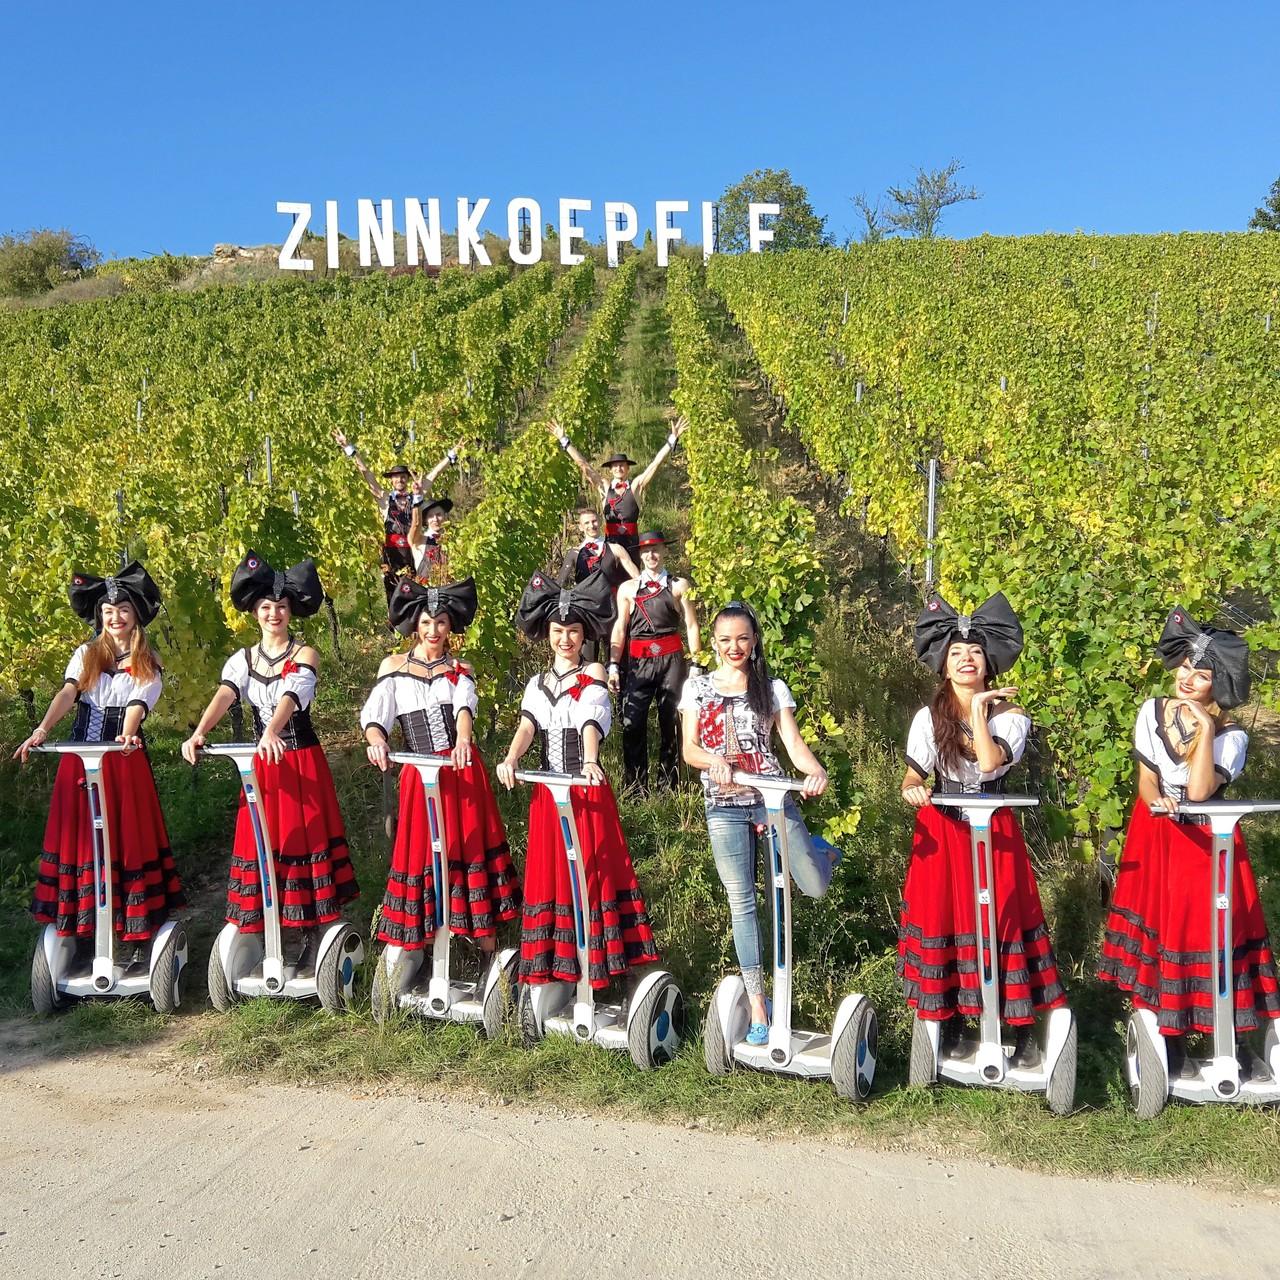 FUN MOVING GYROPODE SEGWAY EN ALSACE - vignoble d'Alsace, Le Paradis des Sources